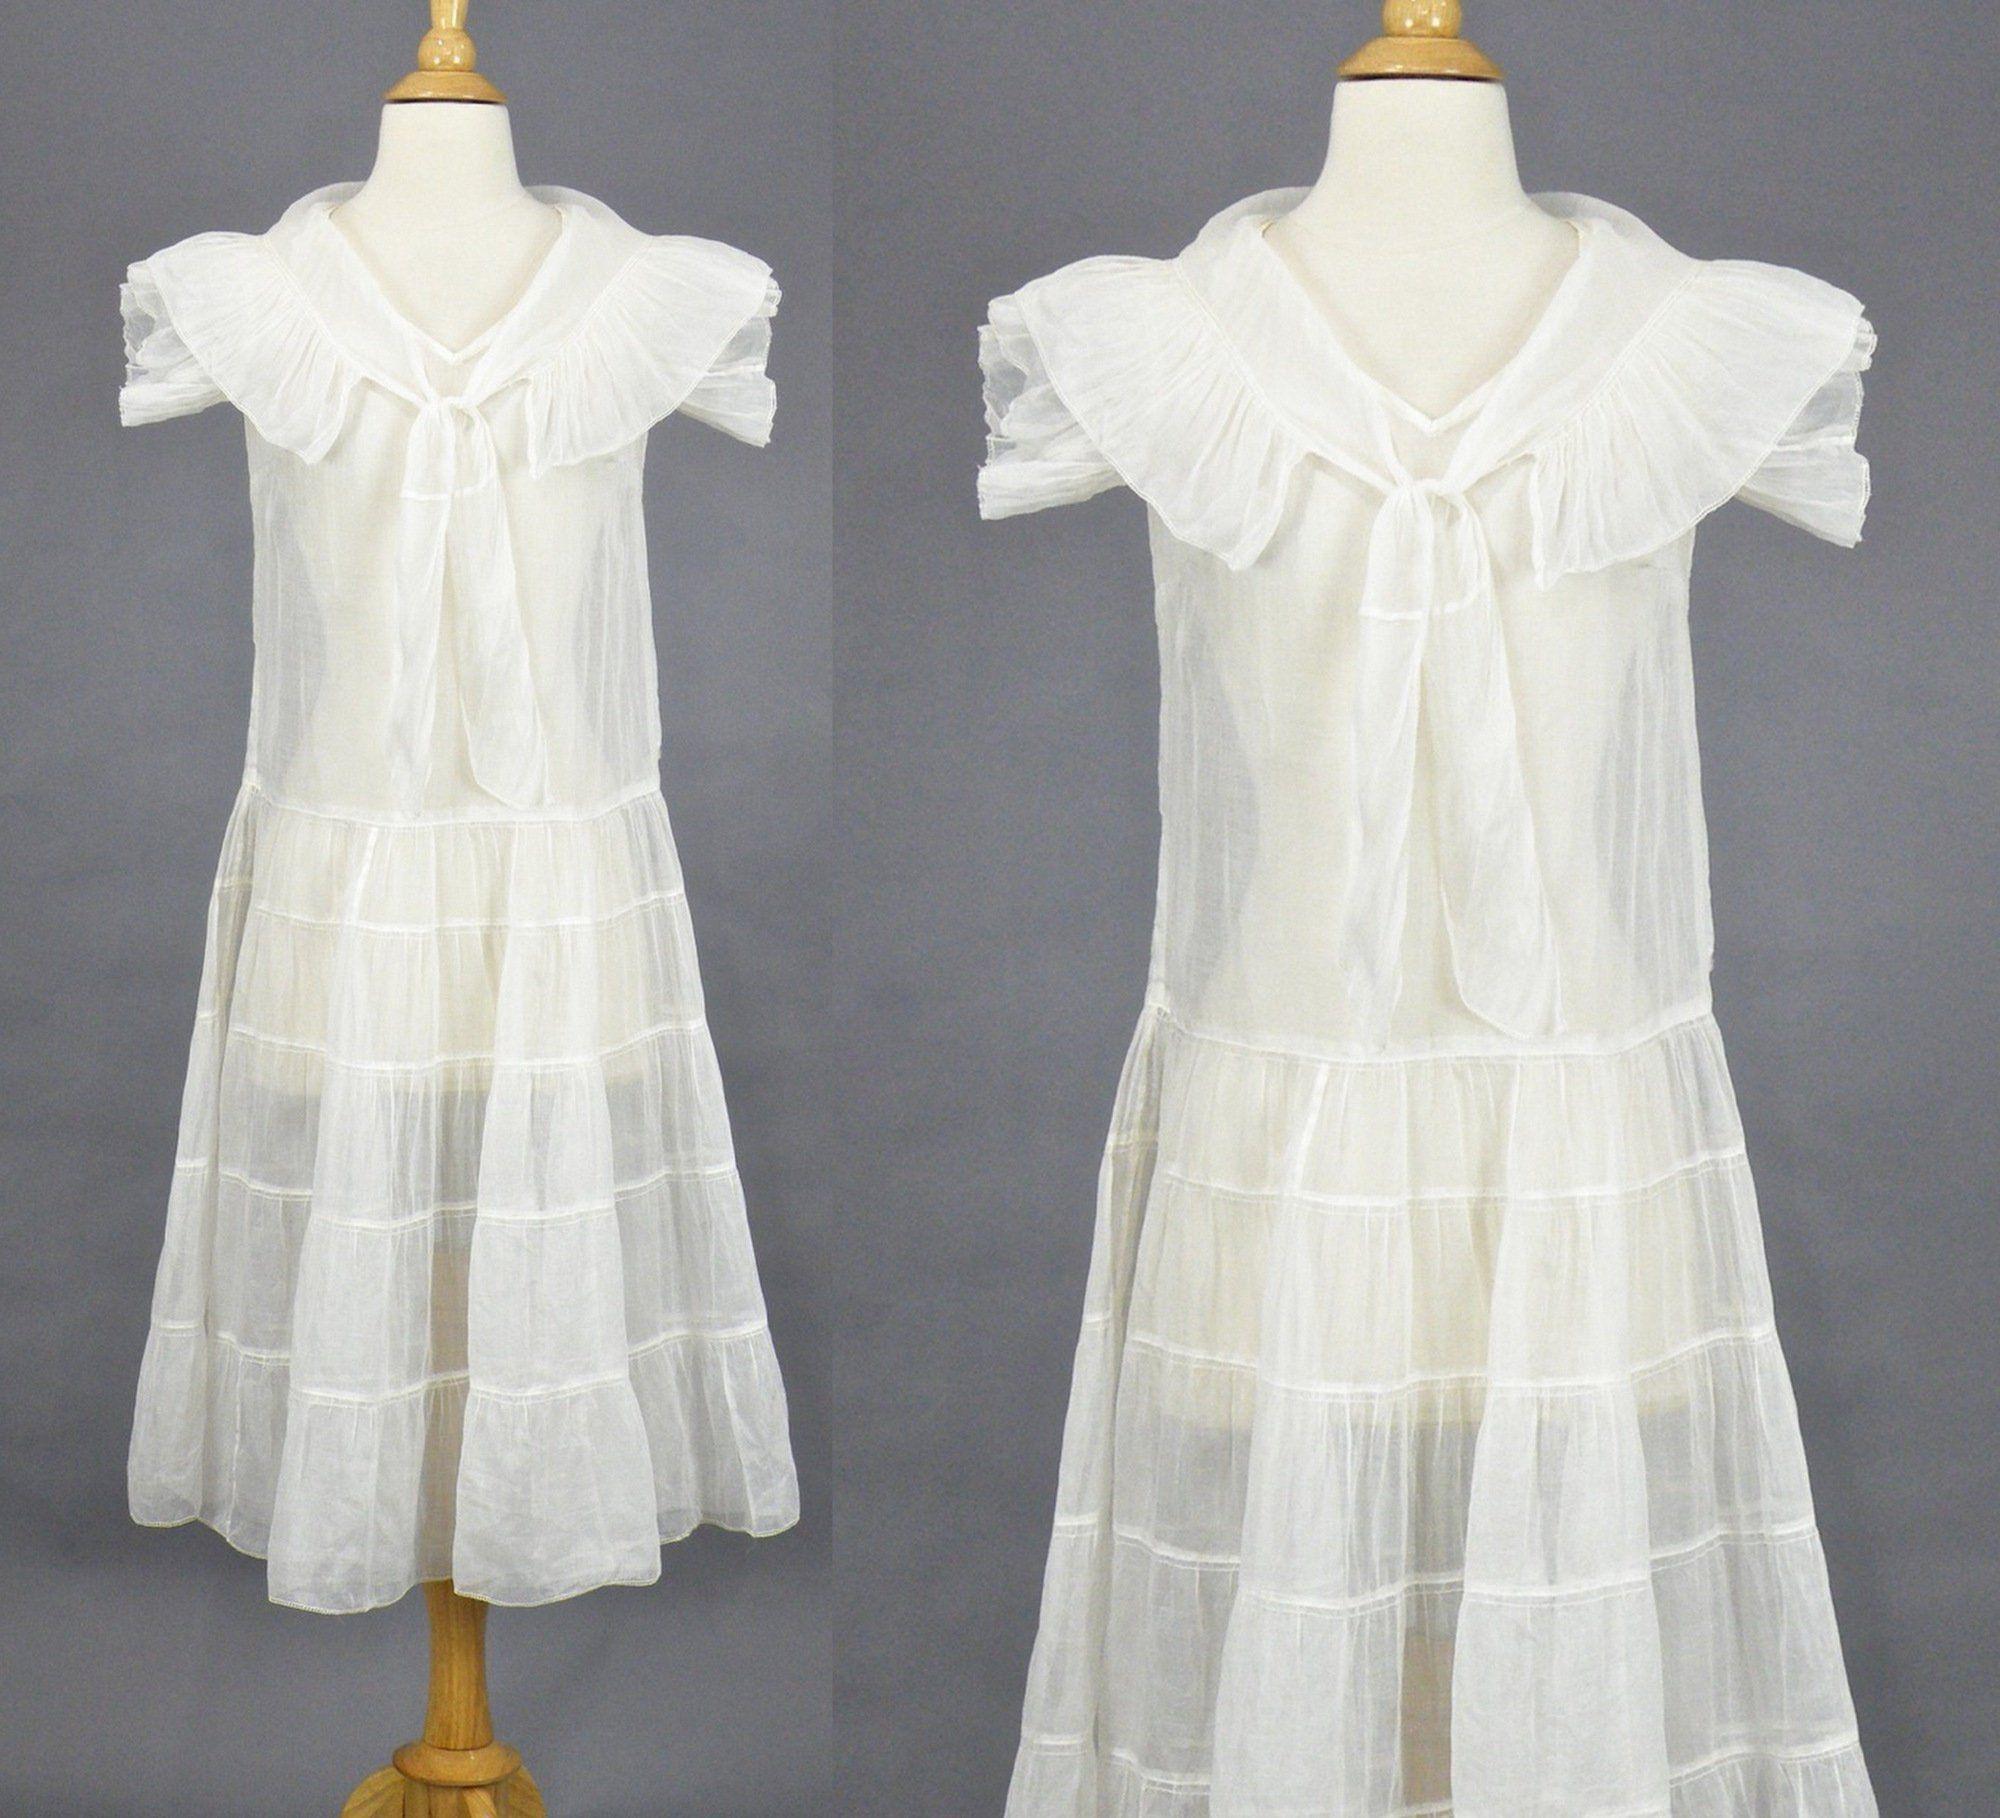 2bbb32ae178 Vintage 20s Dress